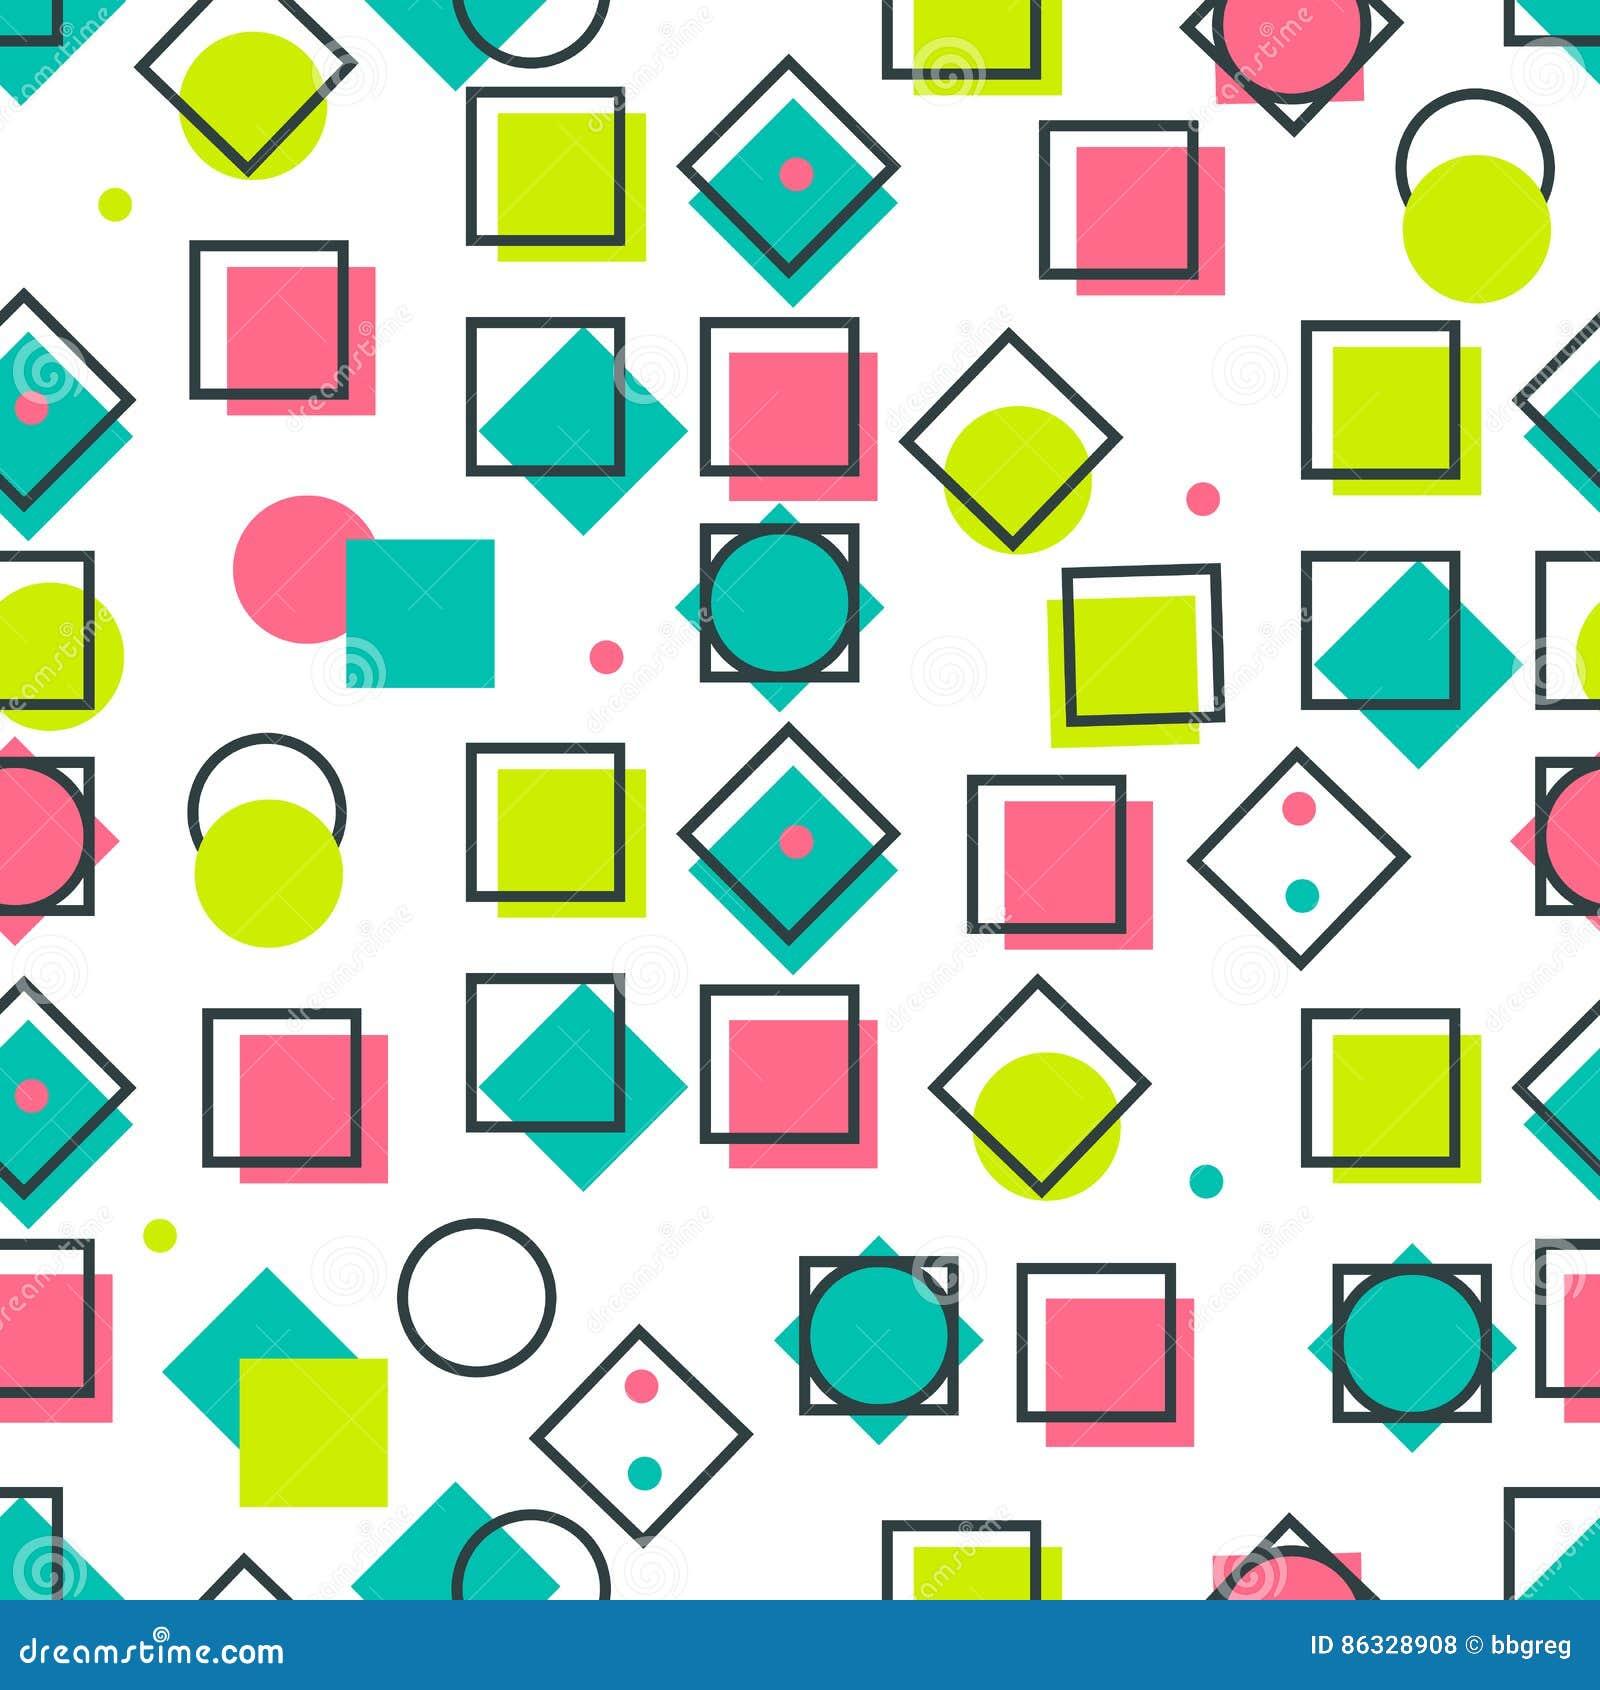 Trendy Style Geometric Elements Memphis Royalty-Free Stock ...